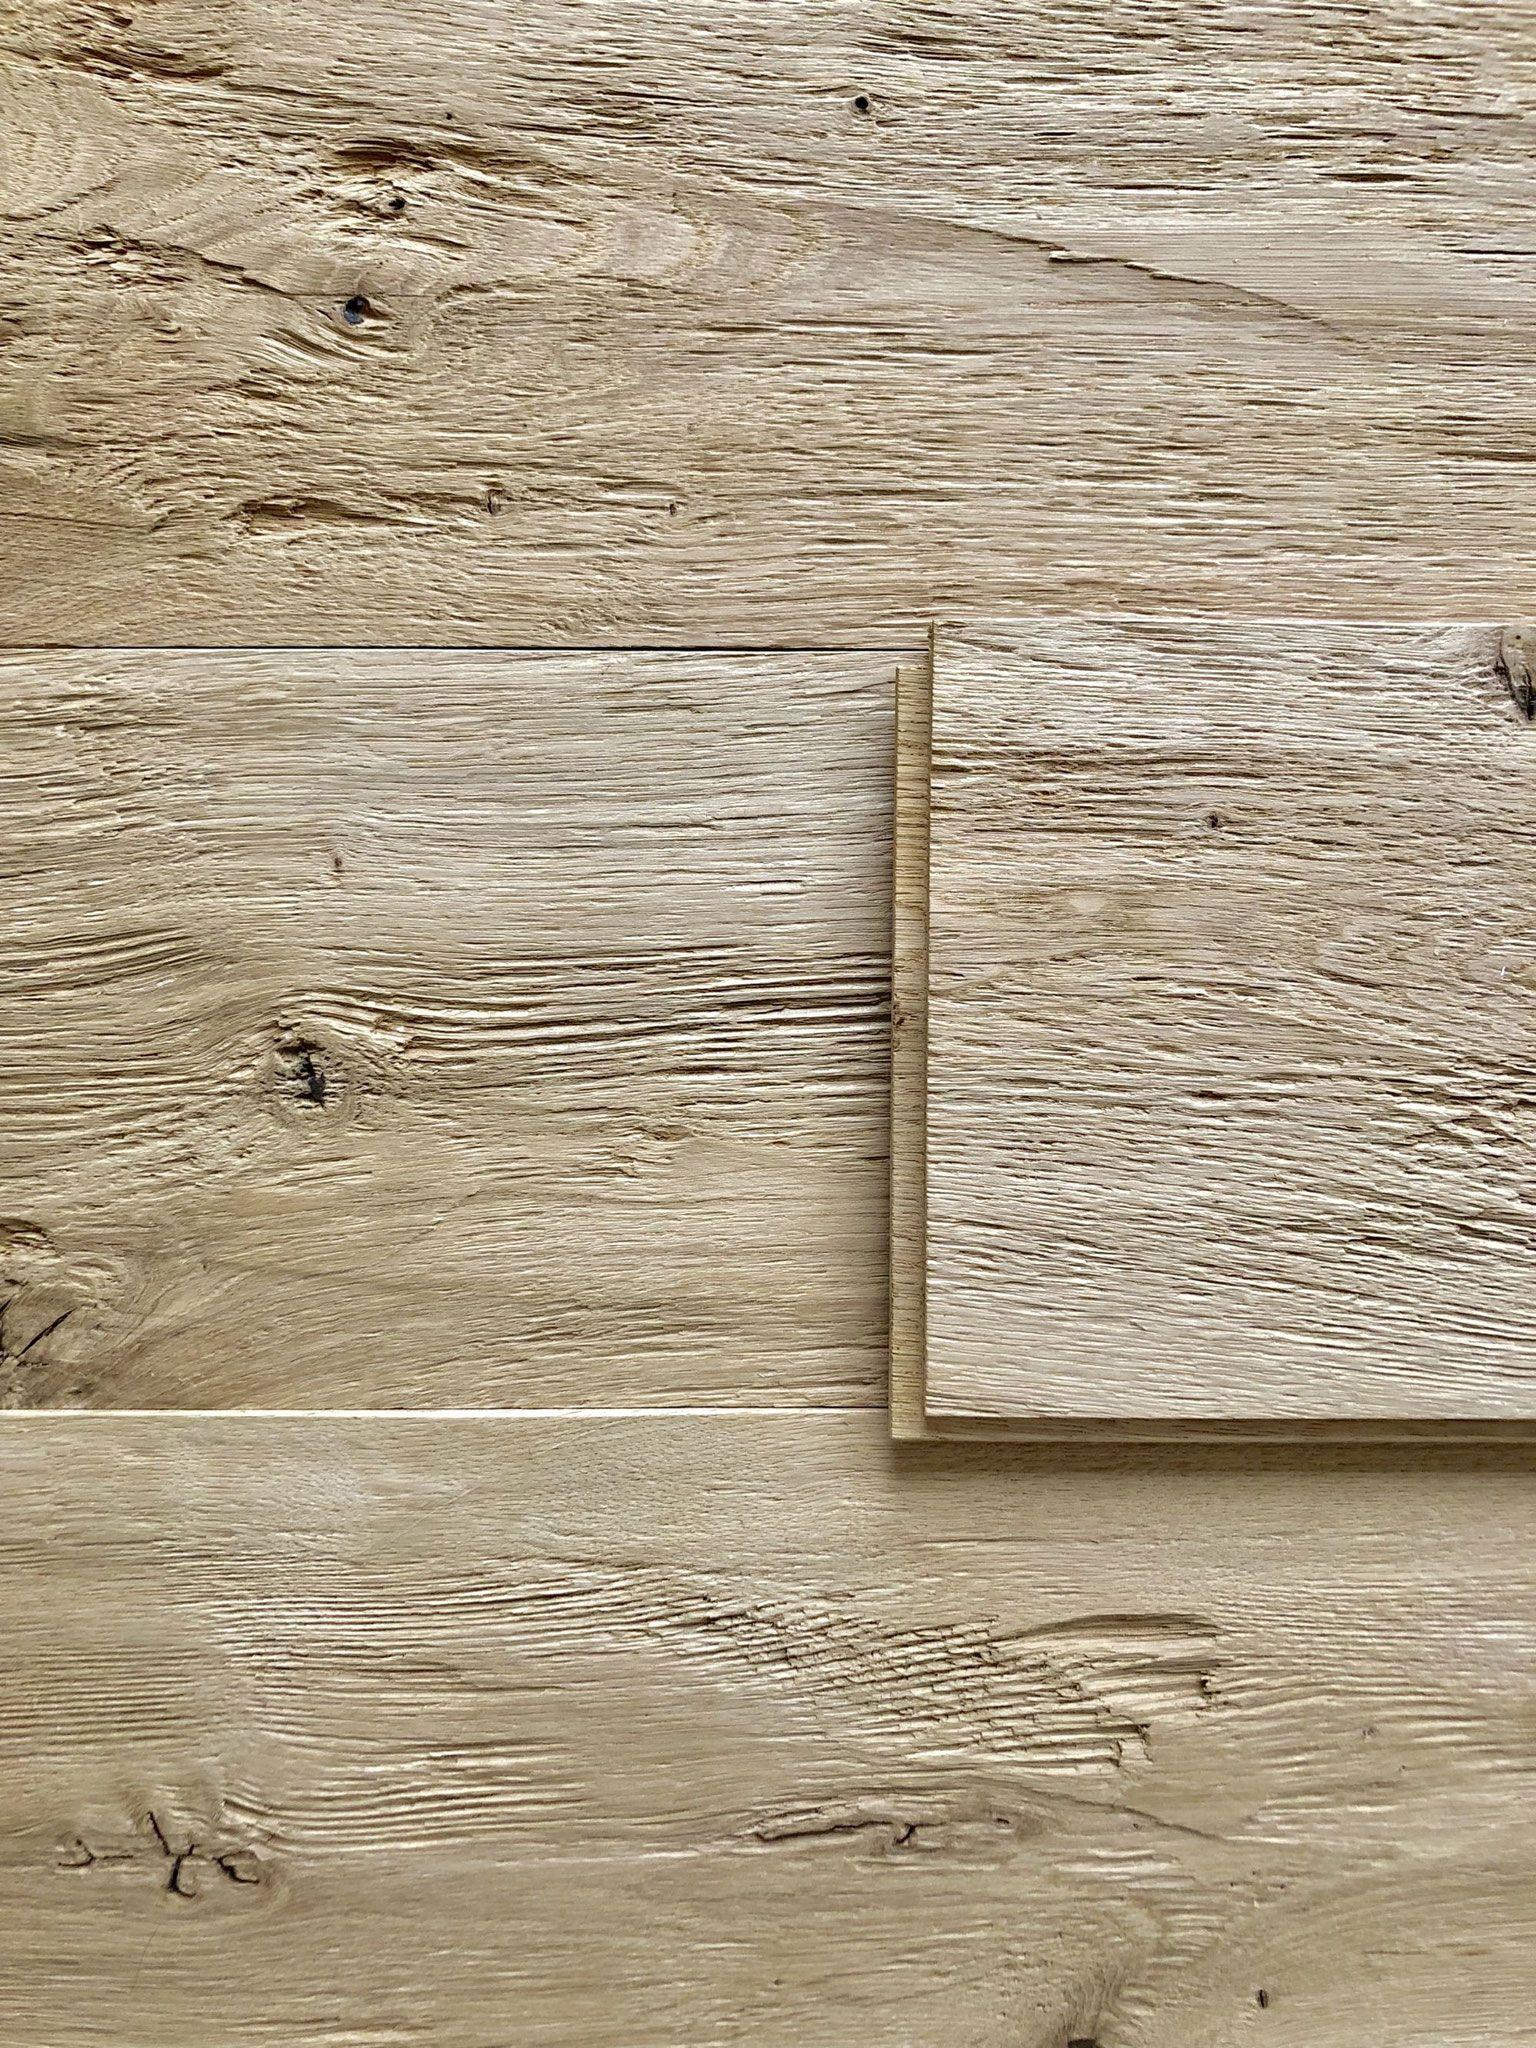 Fichte Natur Vintage Holz Altholz Wandverkleidung Wandverkleidung Holz Wandverkleidung